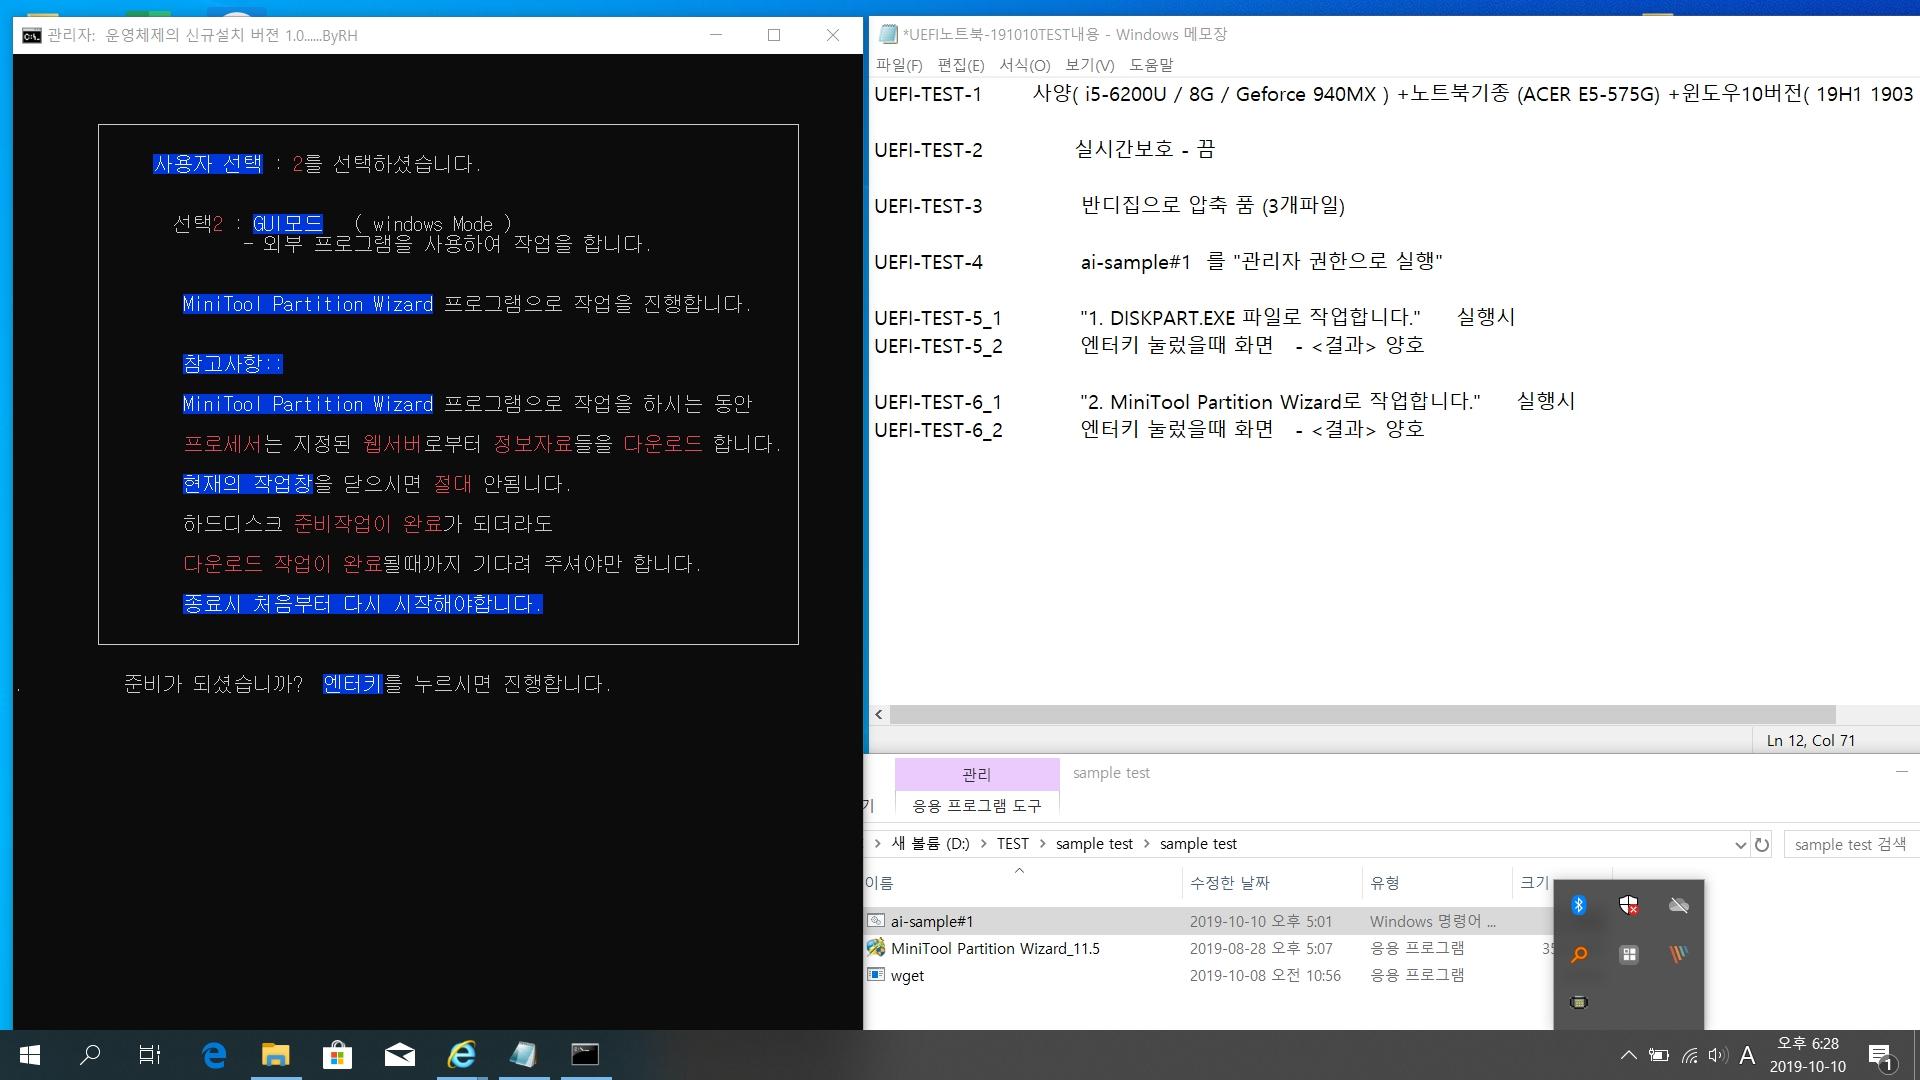 UEFI-TEST-6_1.jpg